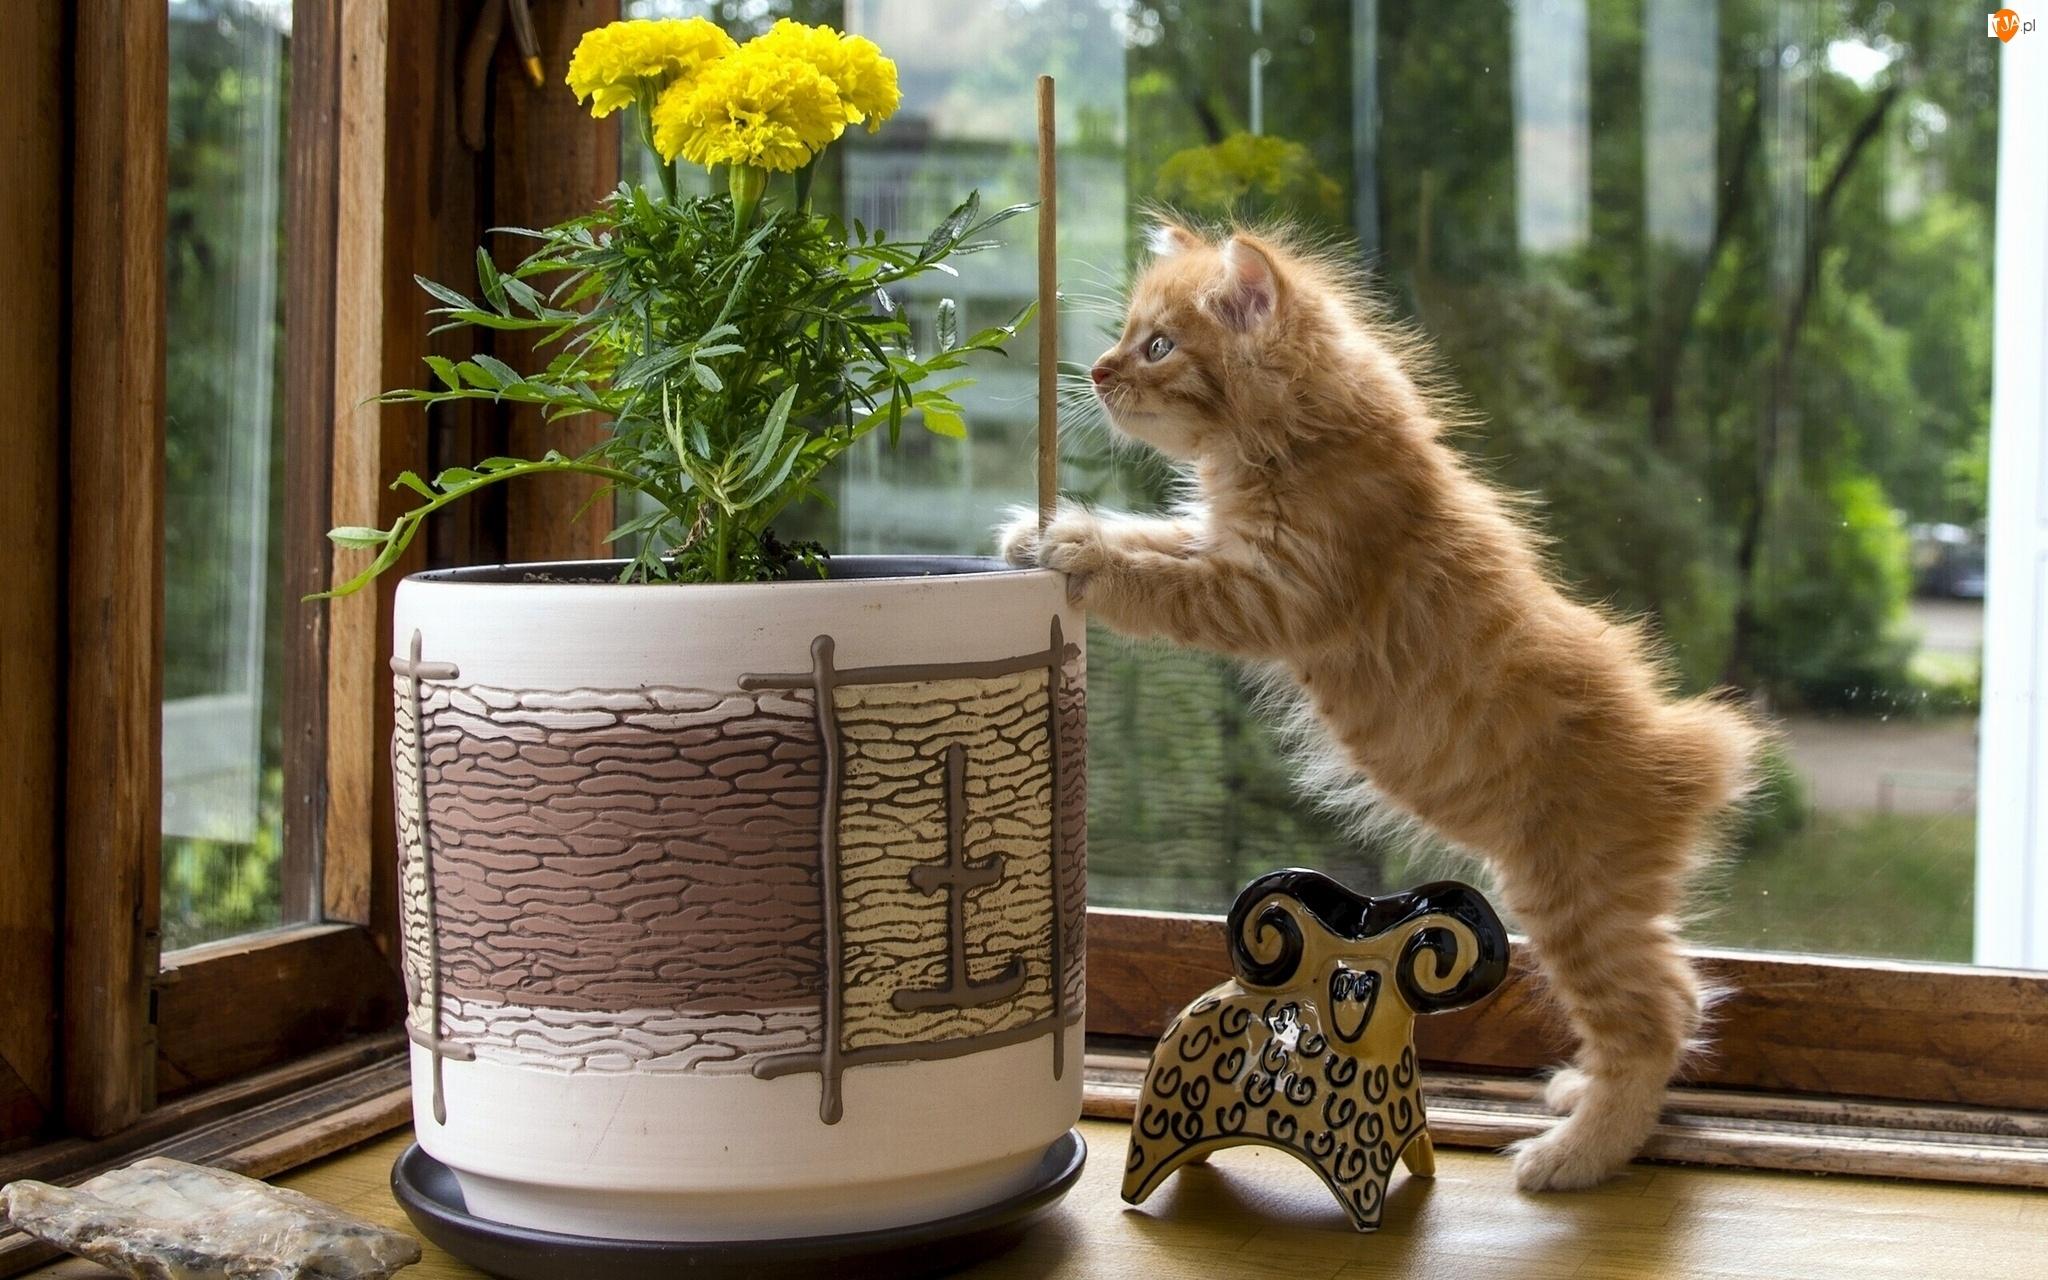 Doniczka, Kot, Kwiaty